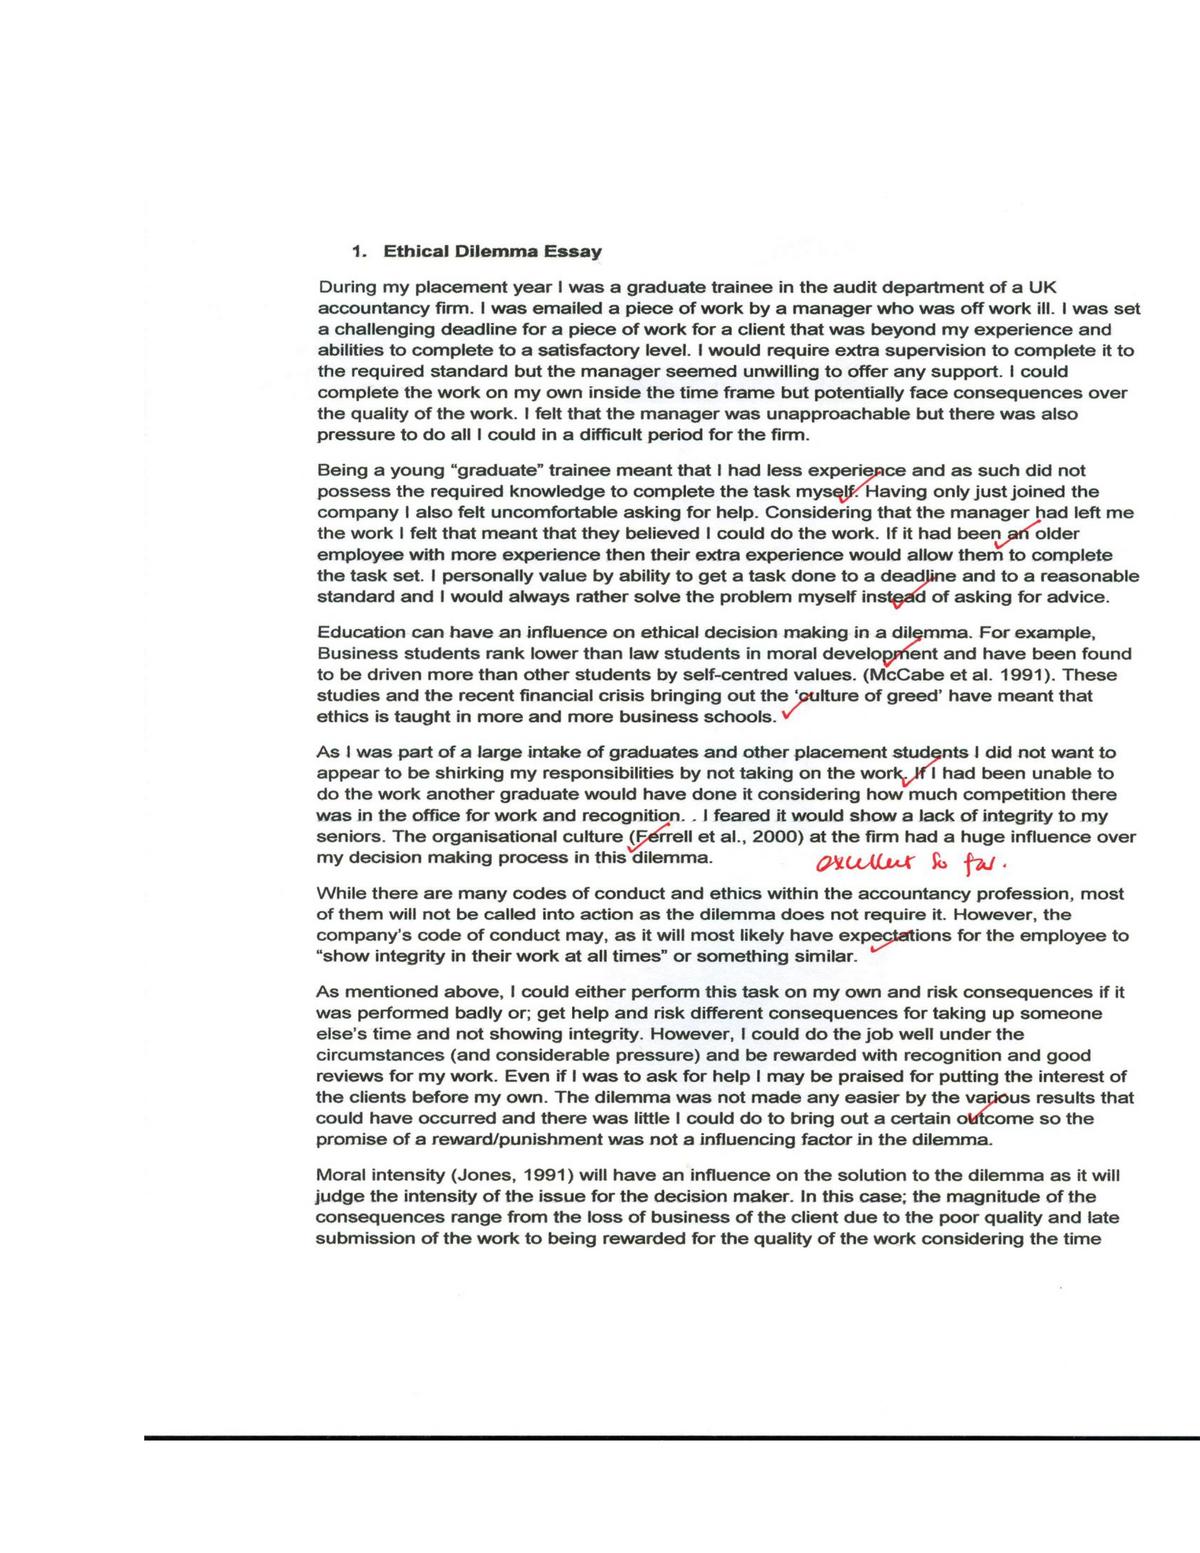 Essays - Ethical dilemma - Business Ethical - SM 0381 - SMU